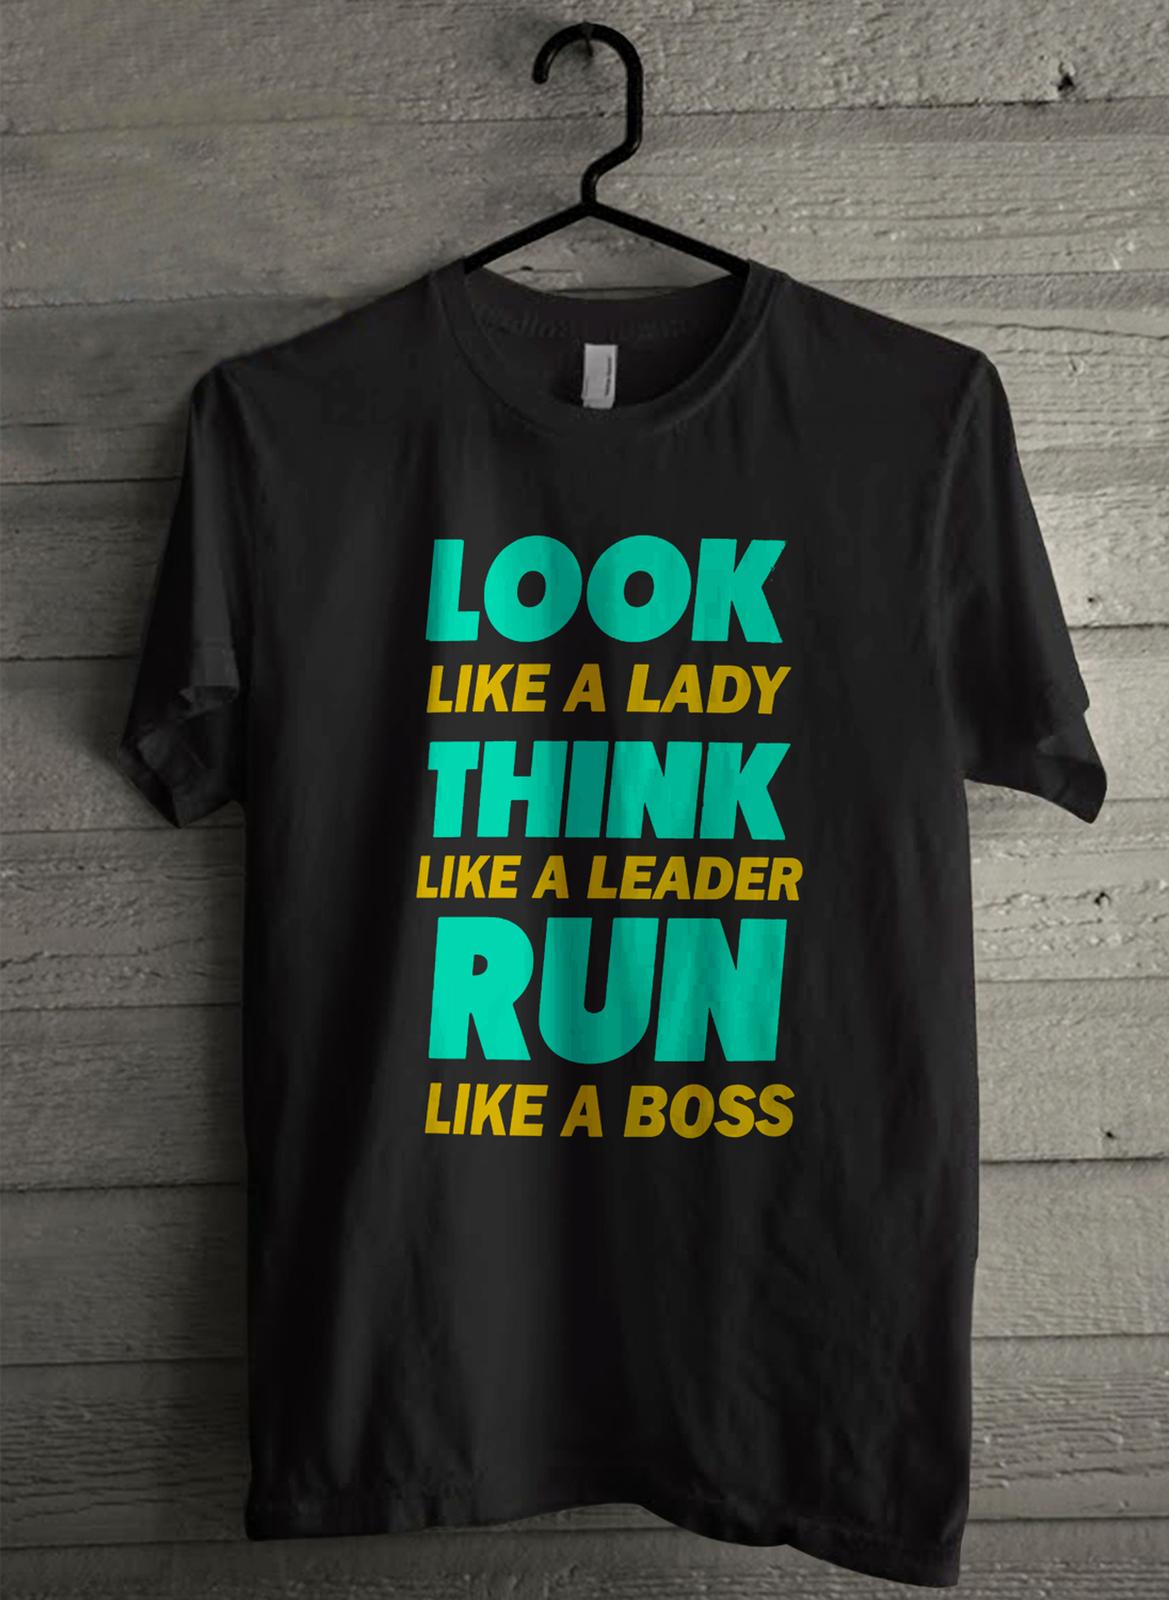 Look like a lady think like a leader run